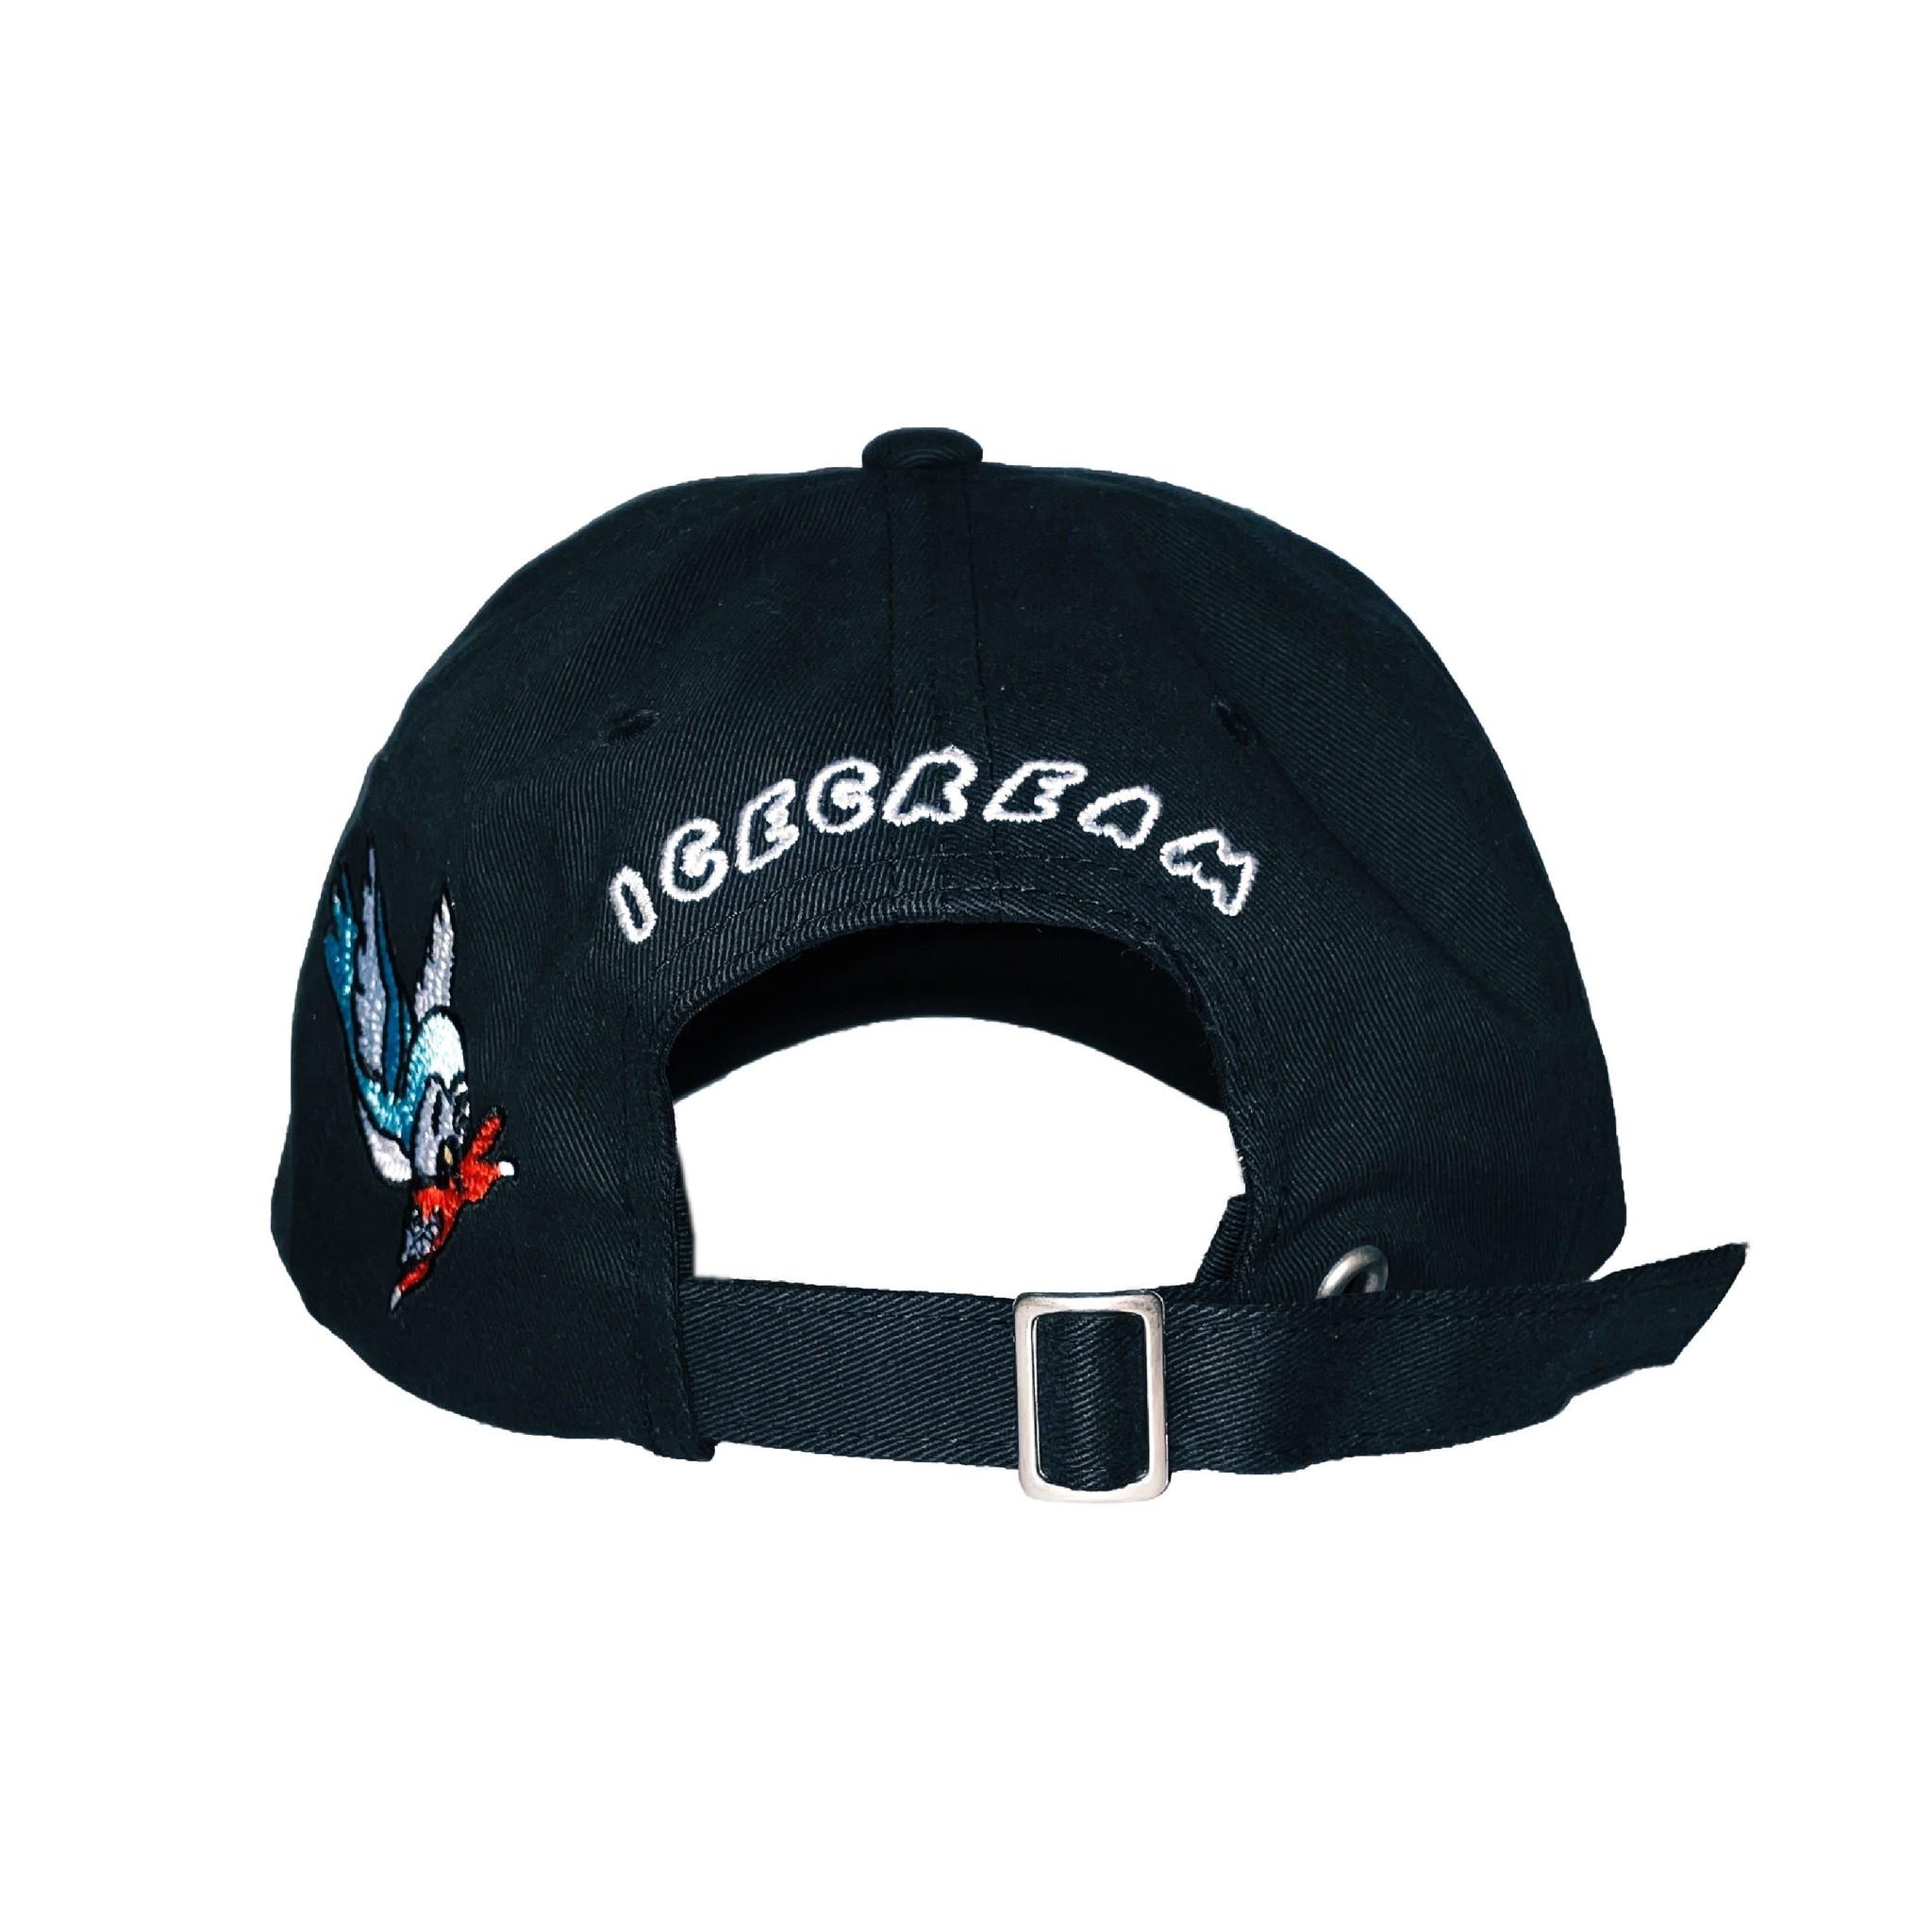 Icecream Icecream House Twill Hat Black